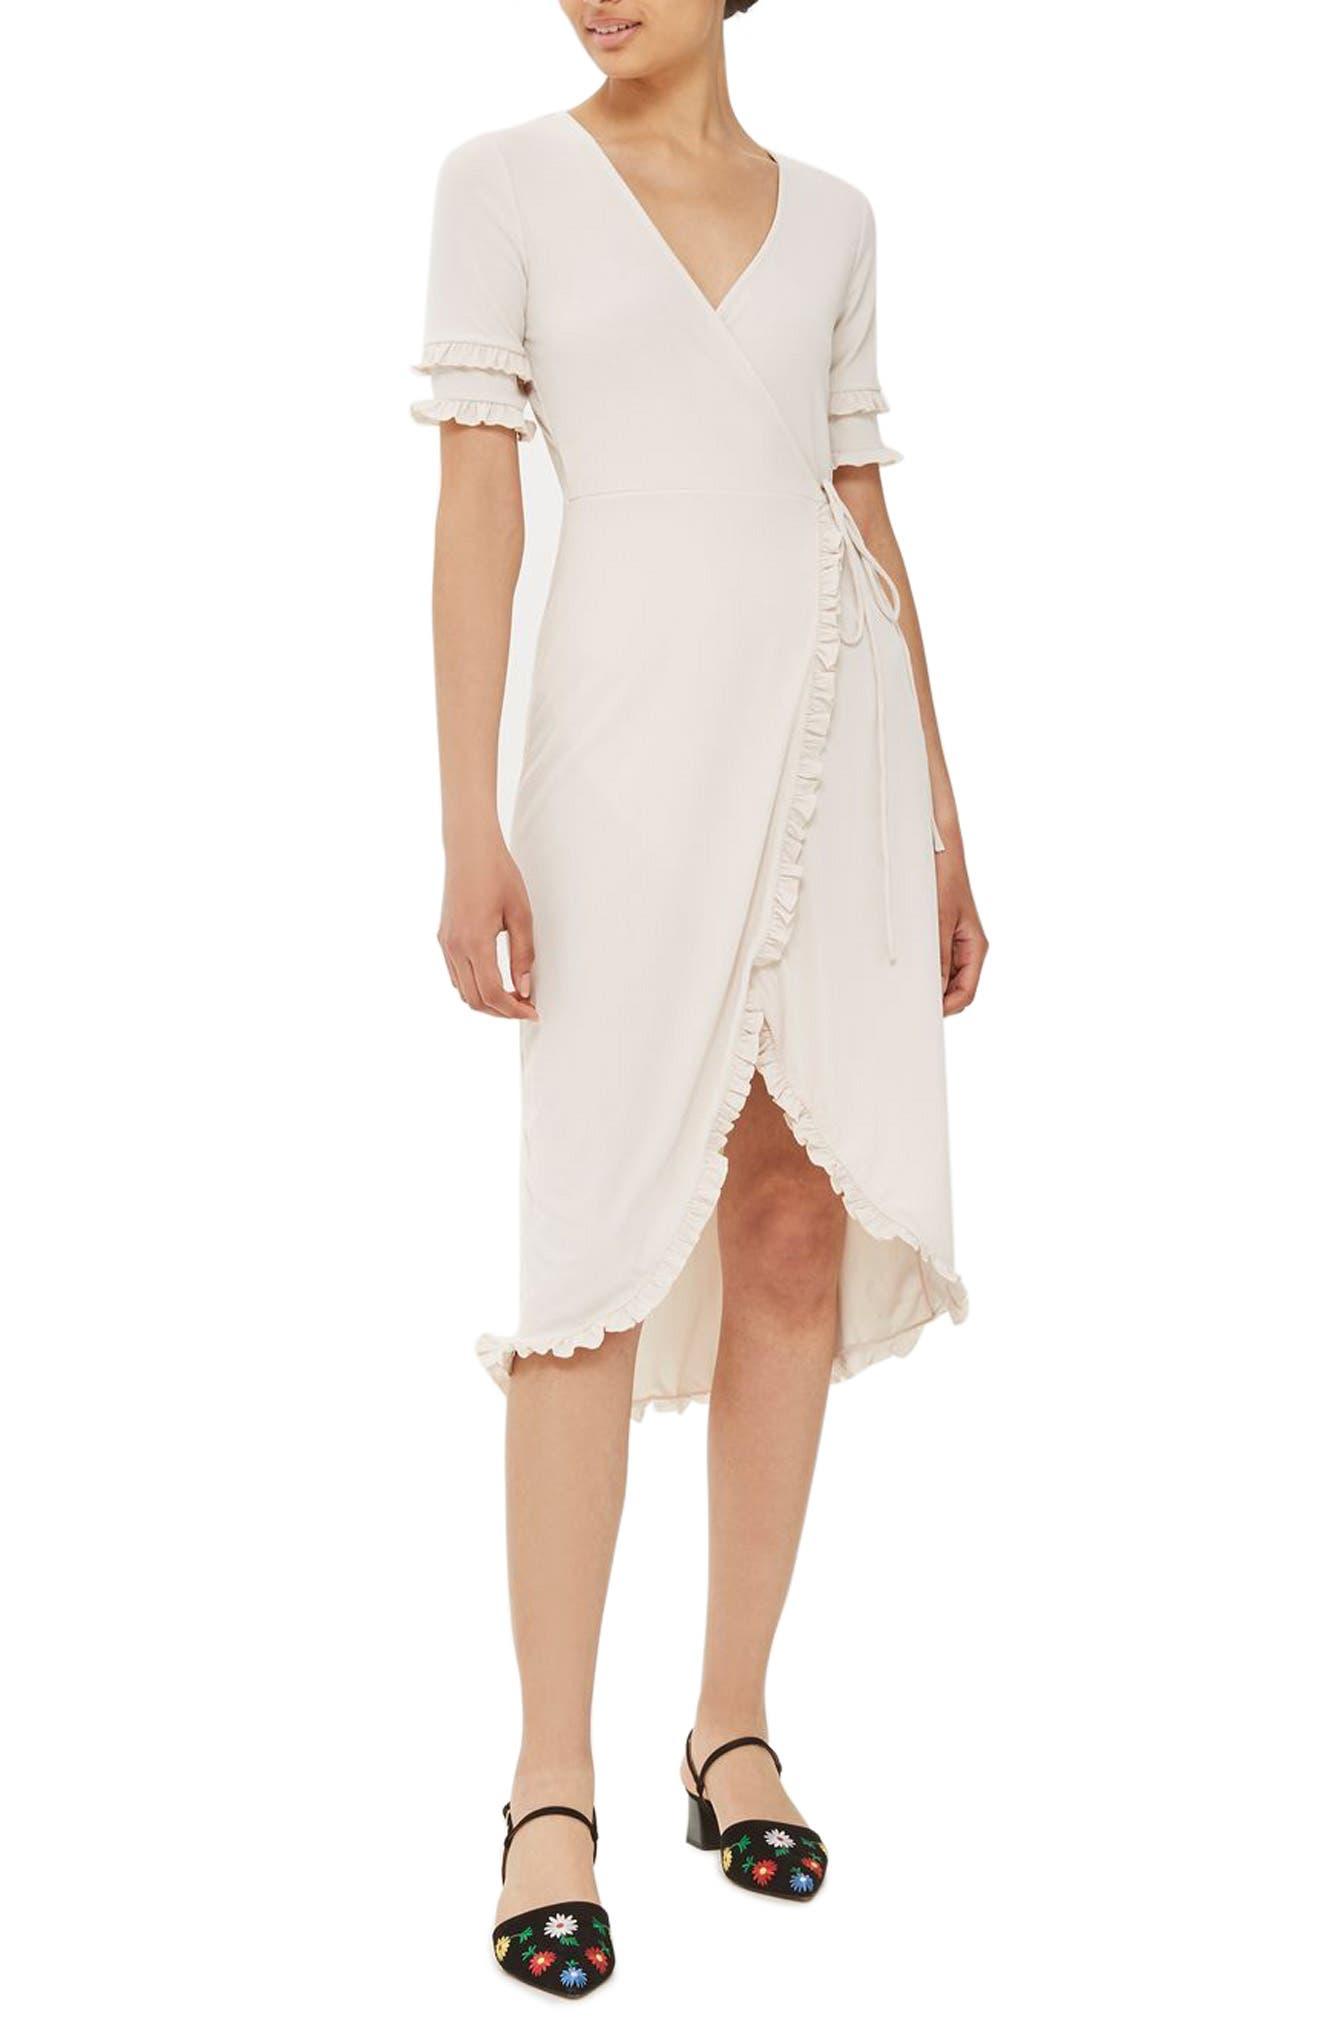 Topshop Ruffle Trim Wrap Dress